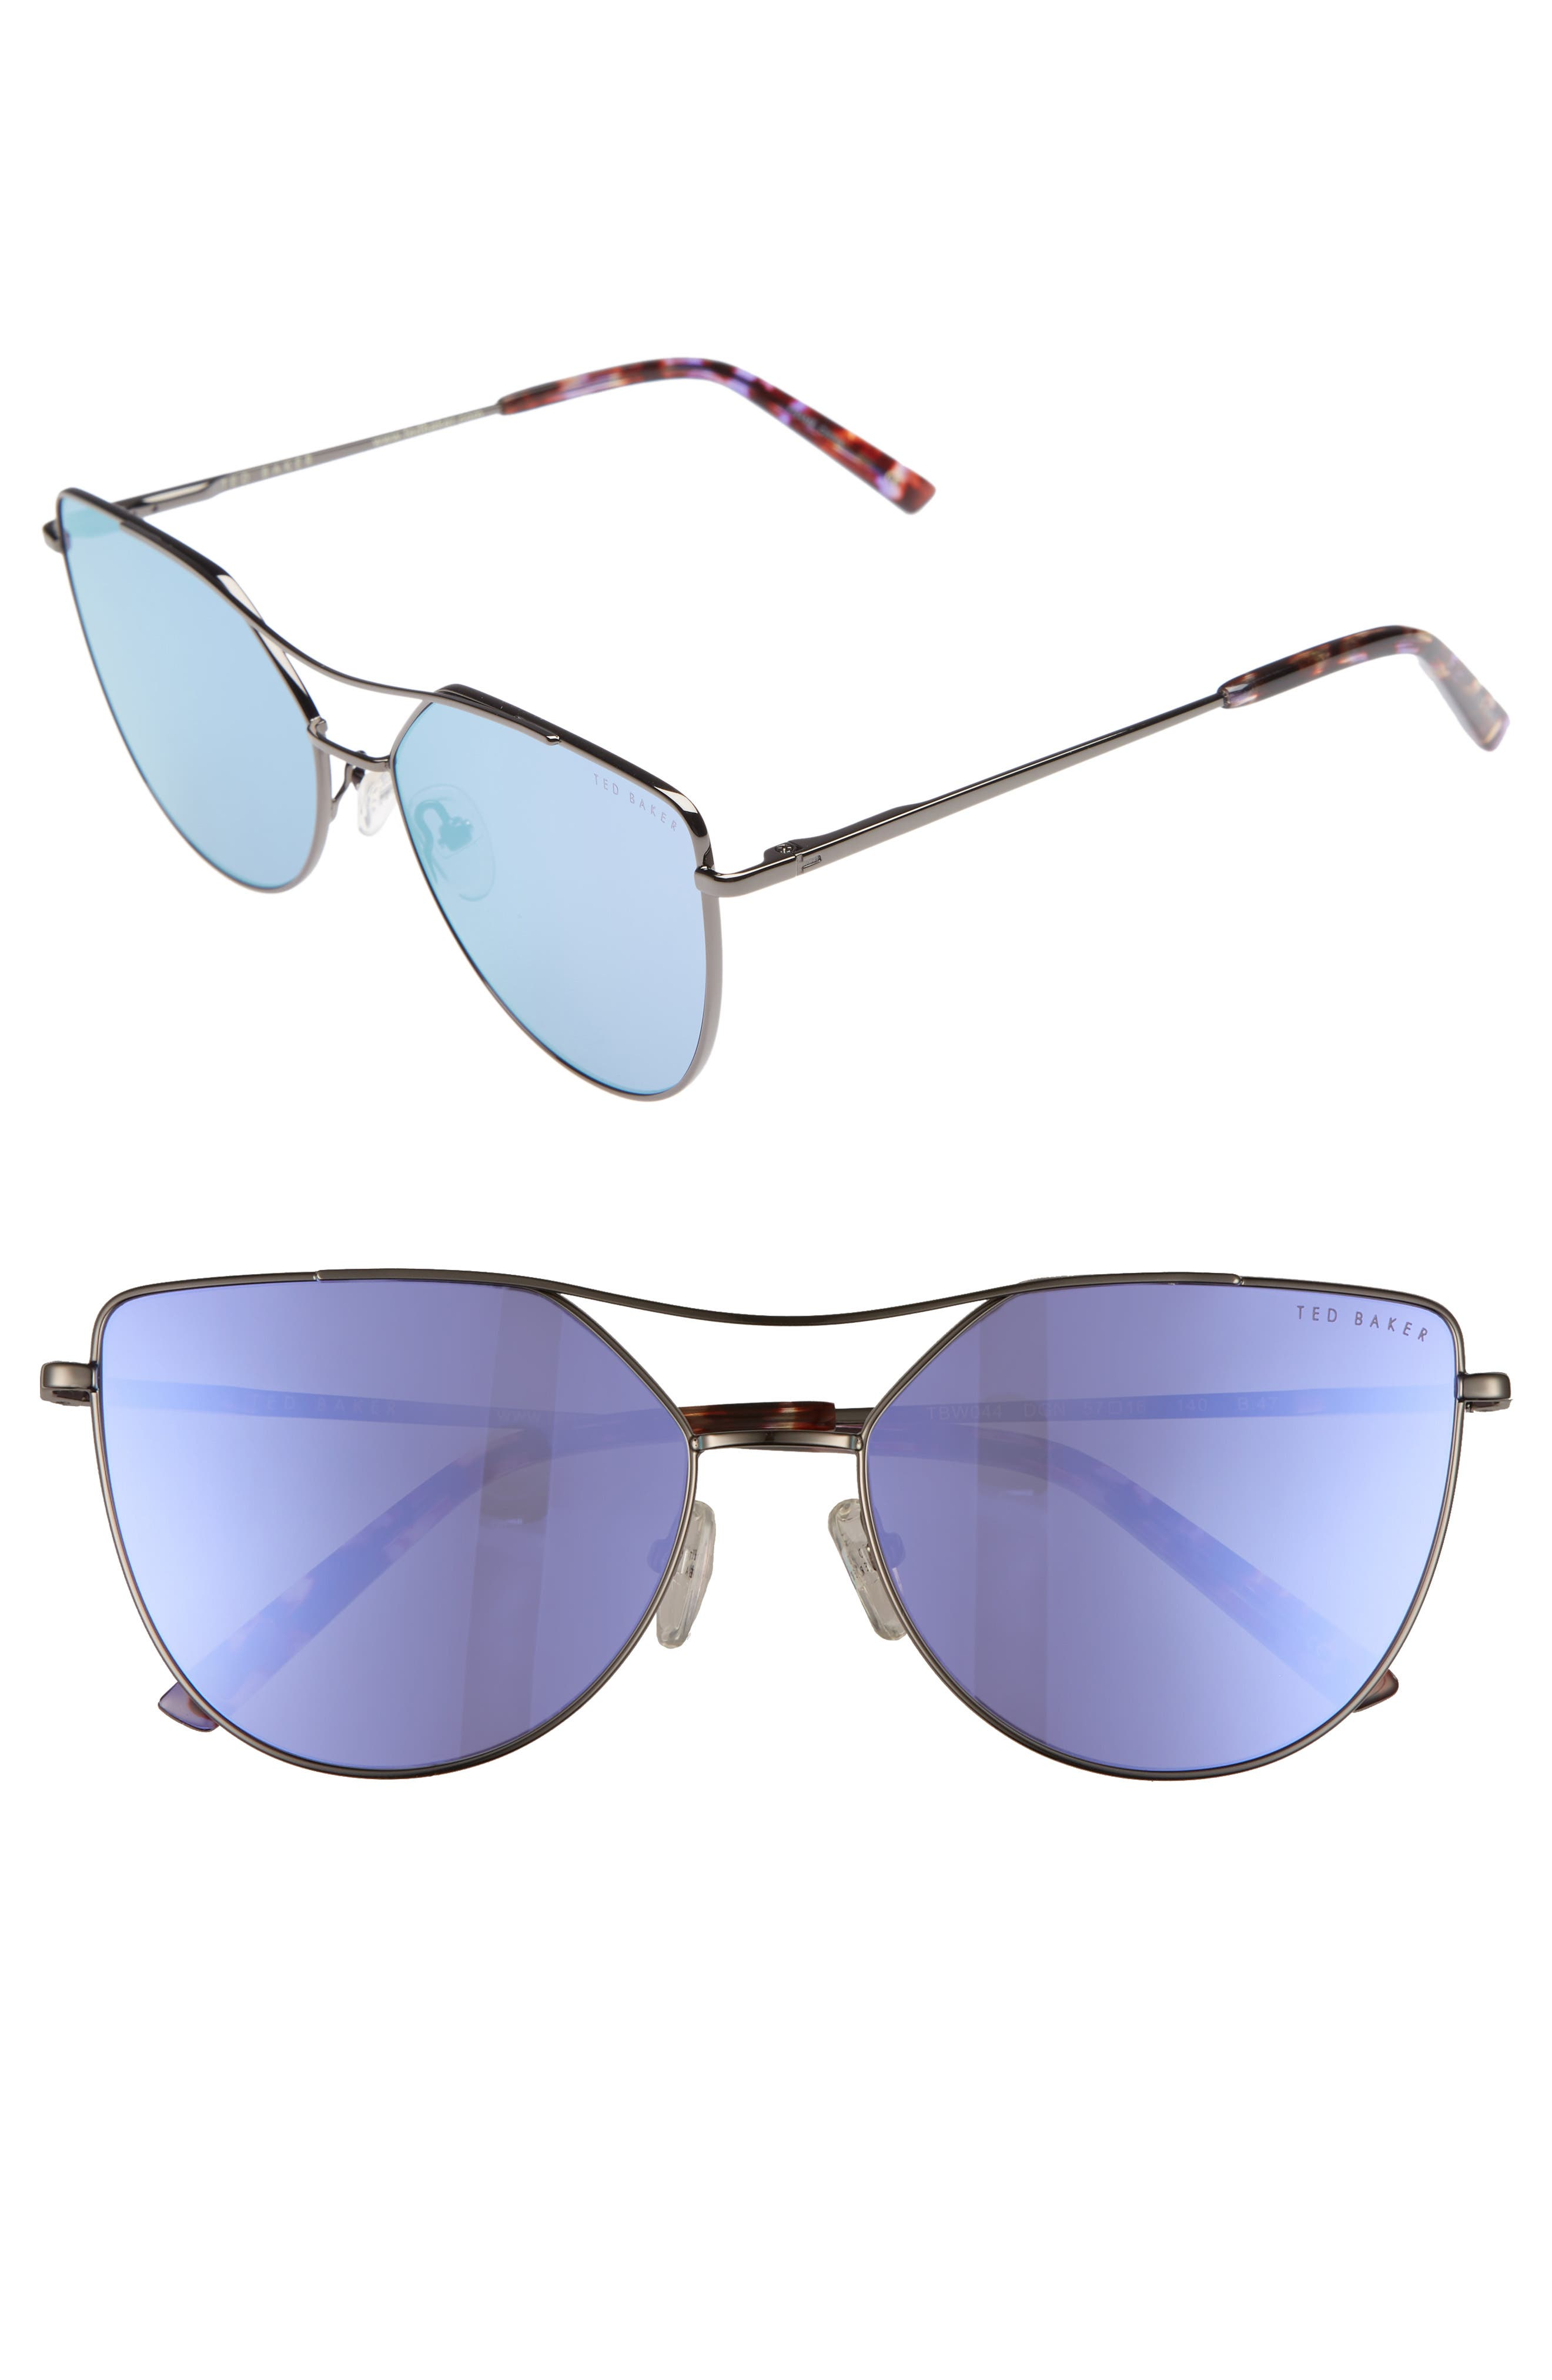 57mm Geometric Aviator Sunglasses,                         Main,                         color, Dark Gunmetal